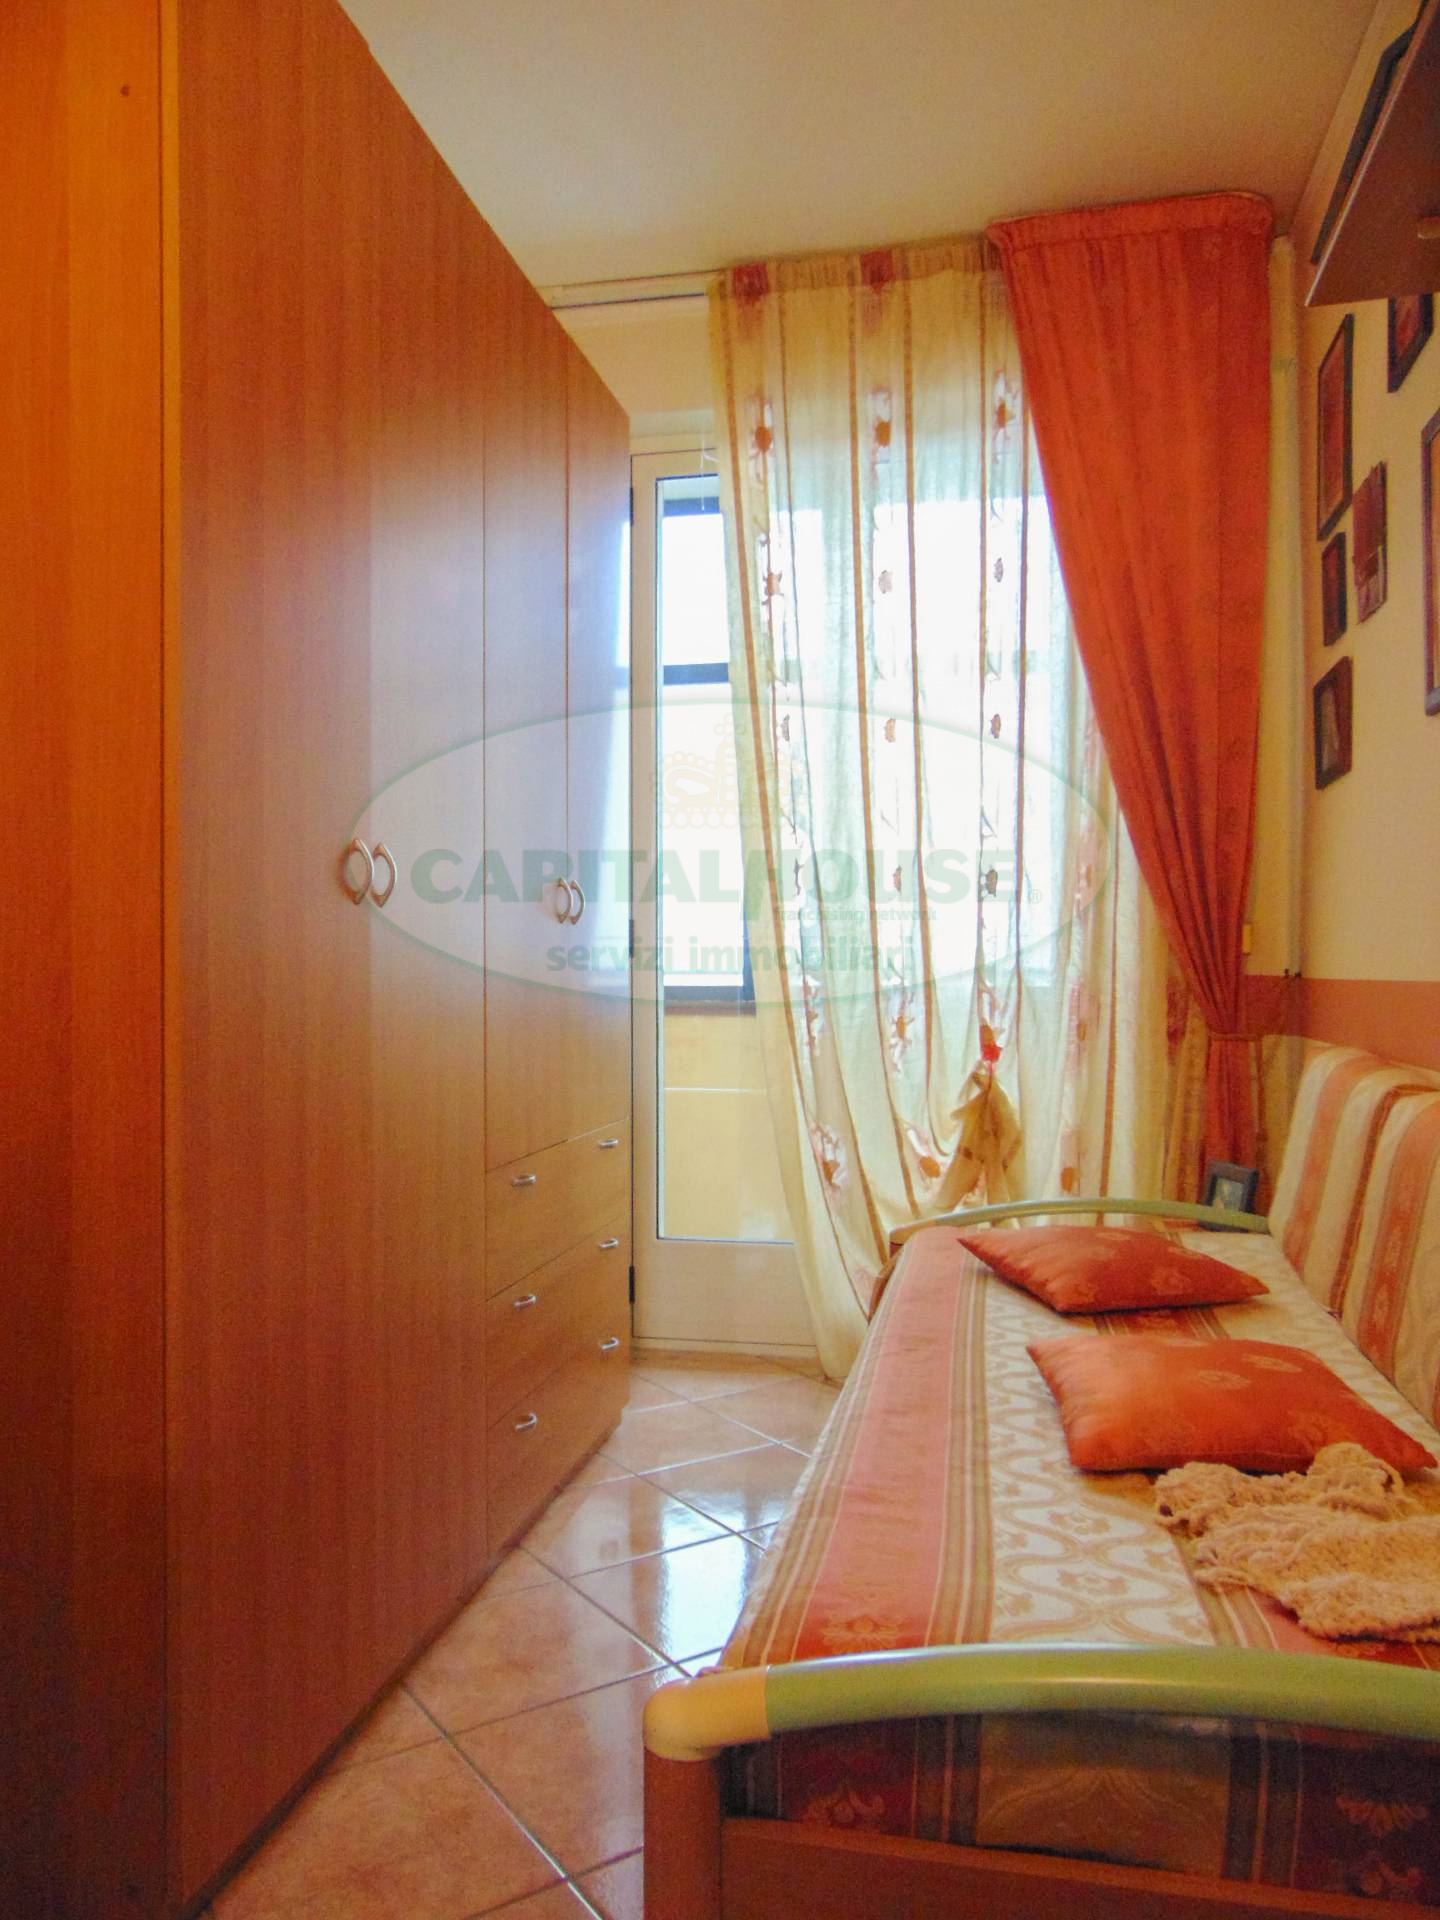 105 pap appartamento in vendita a santa maria capua for Living arredamenti santa maria capua vetere